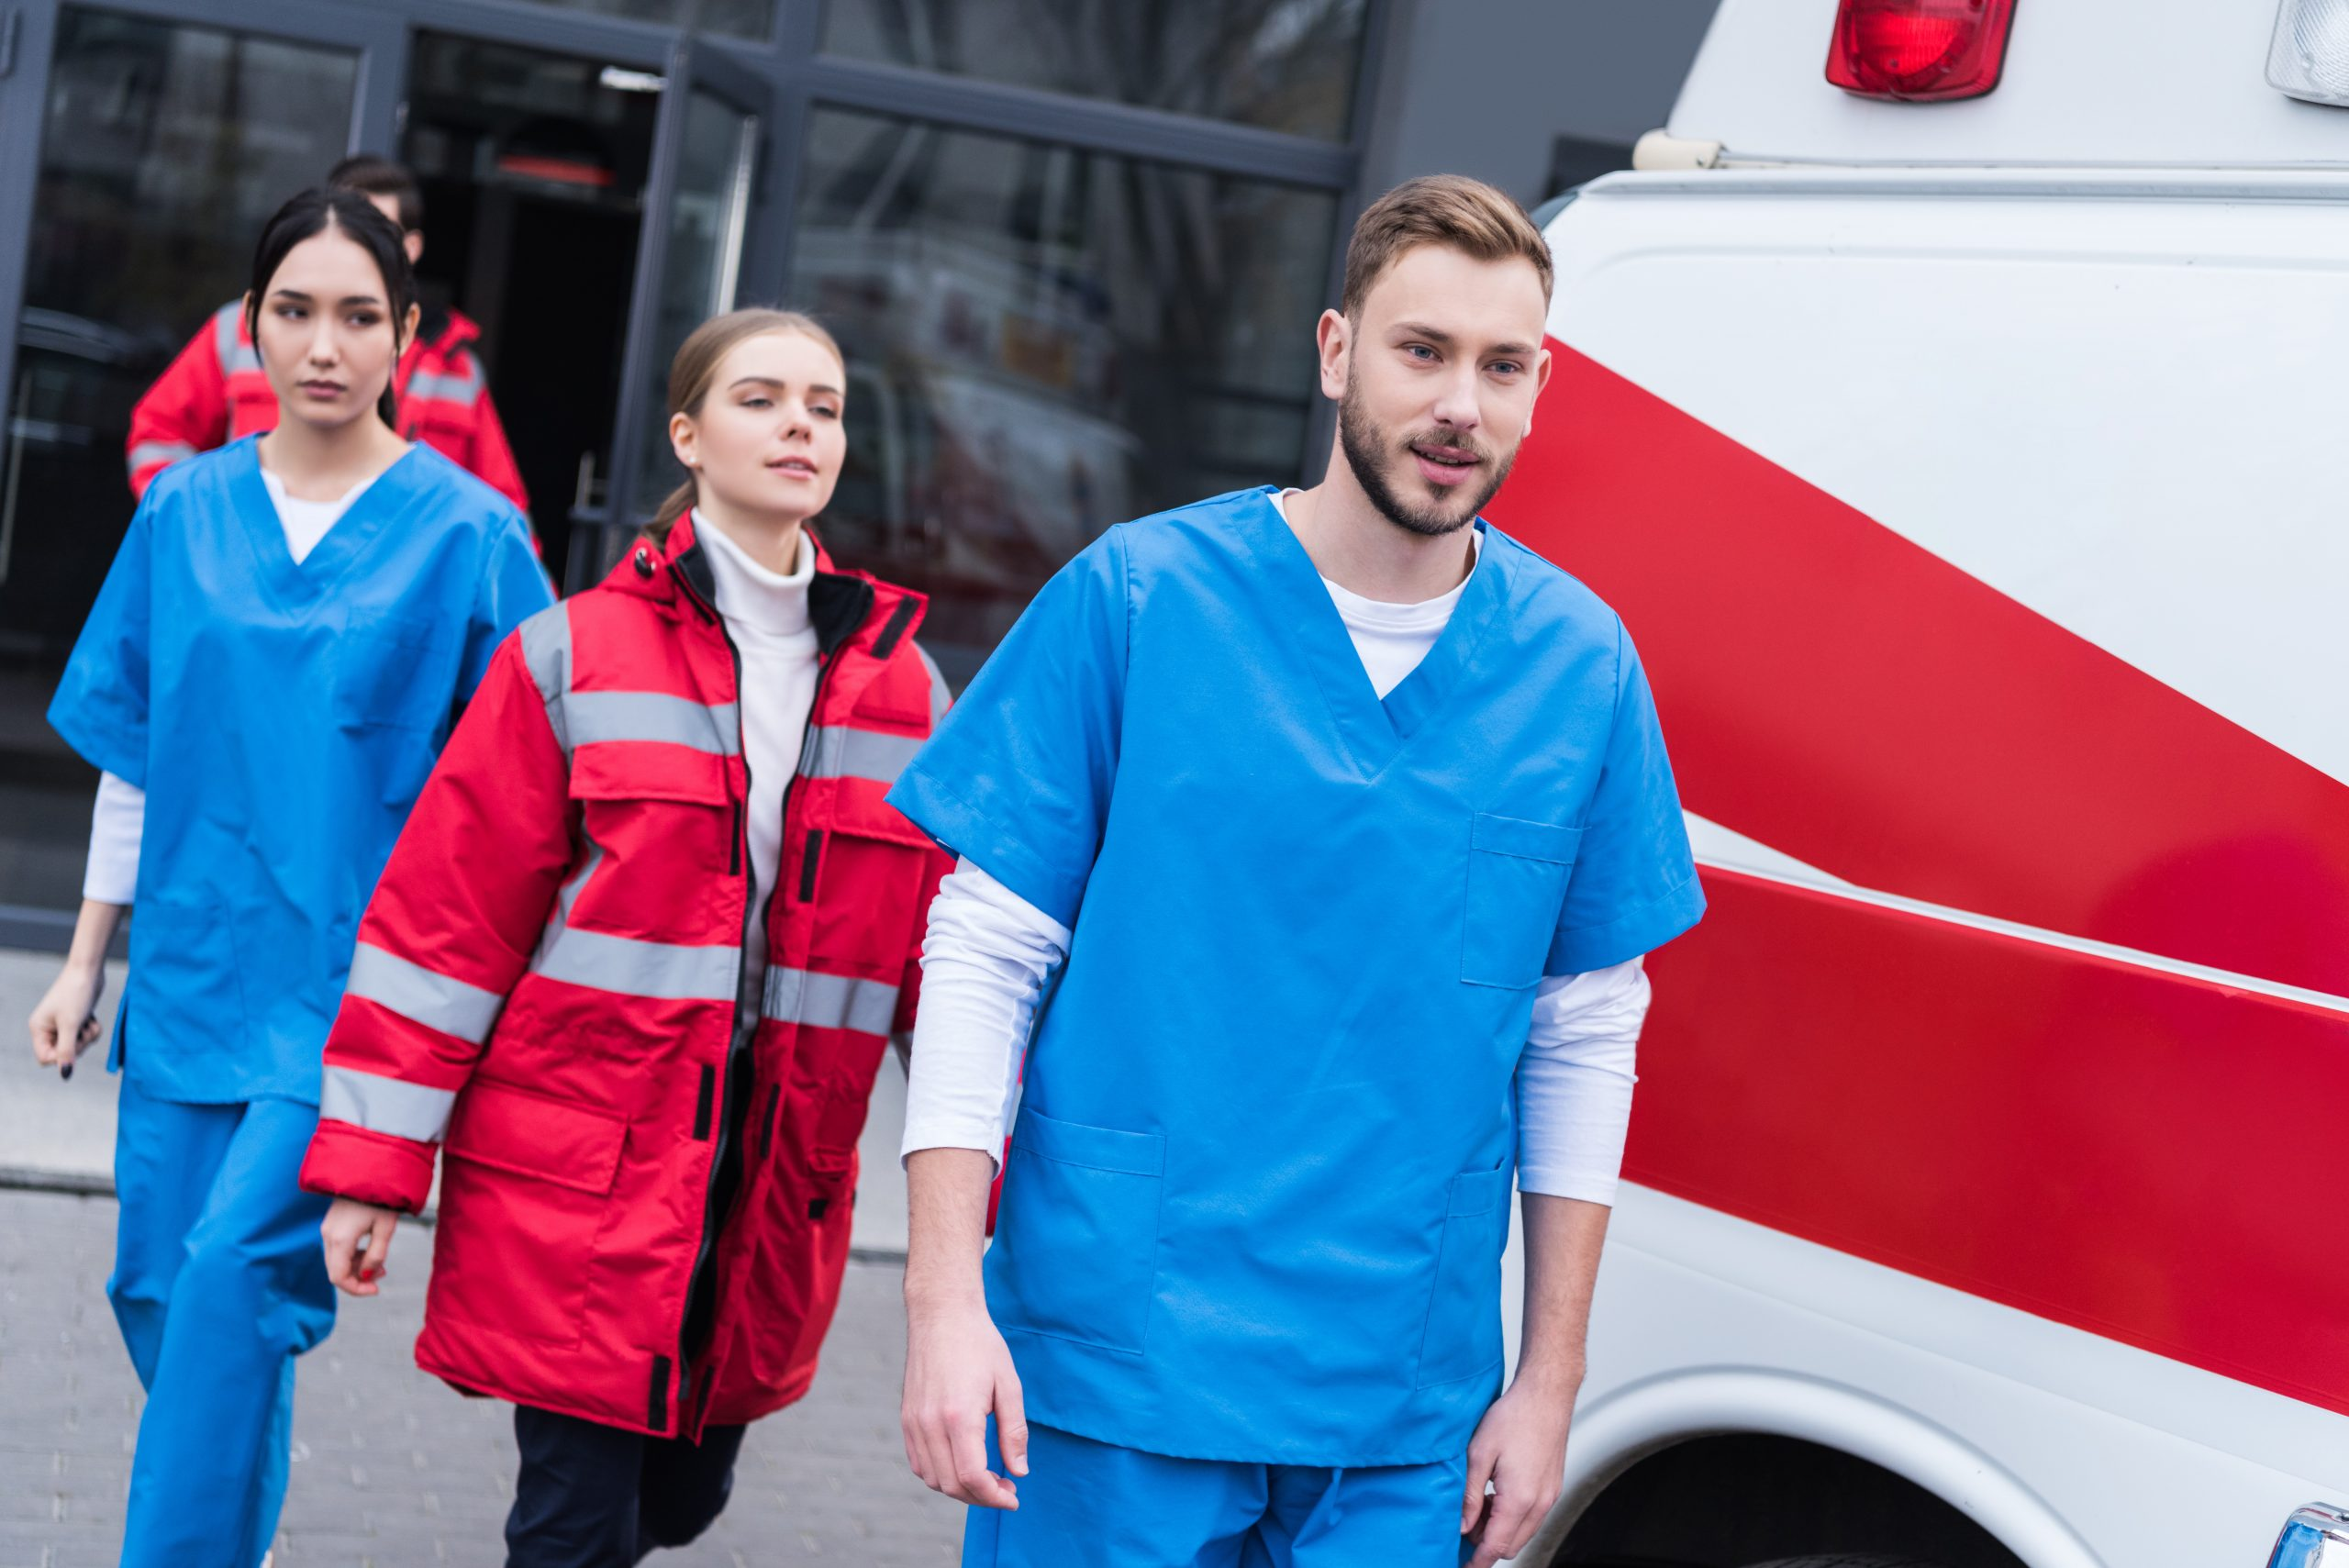 ambulance paramedic team